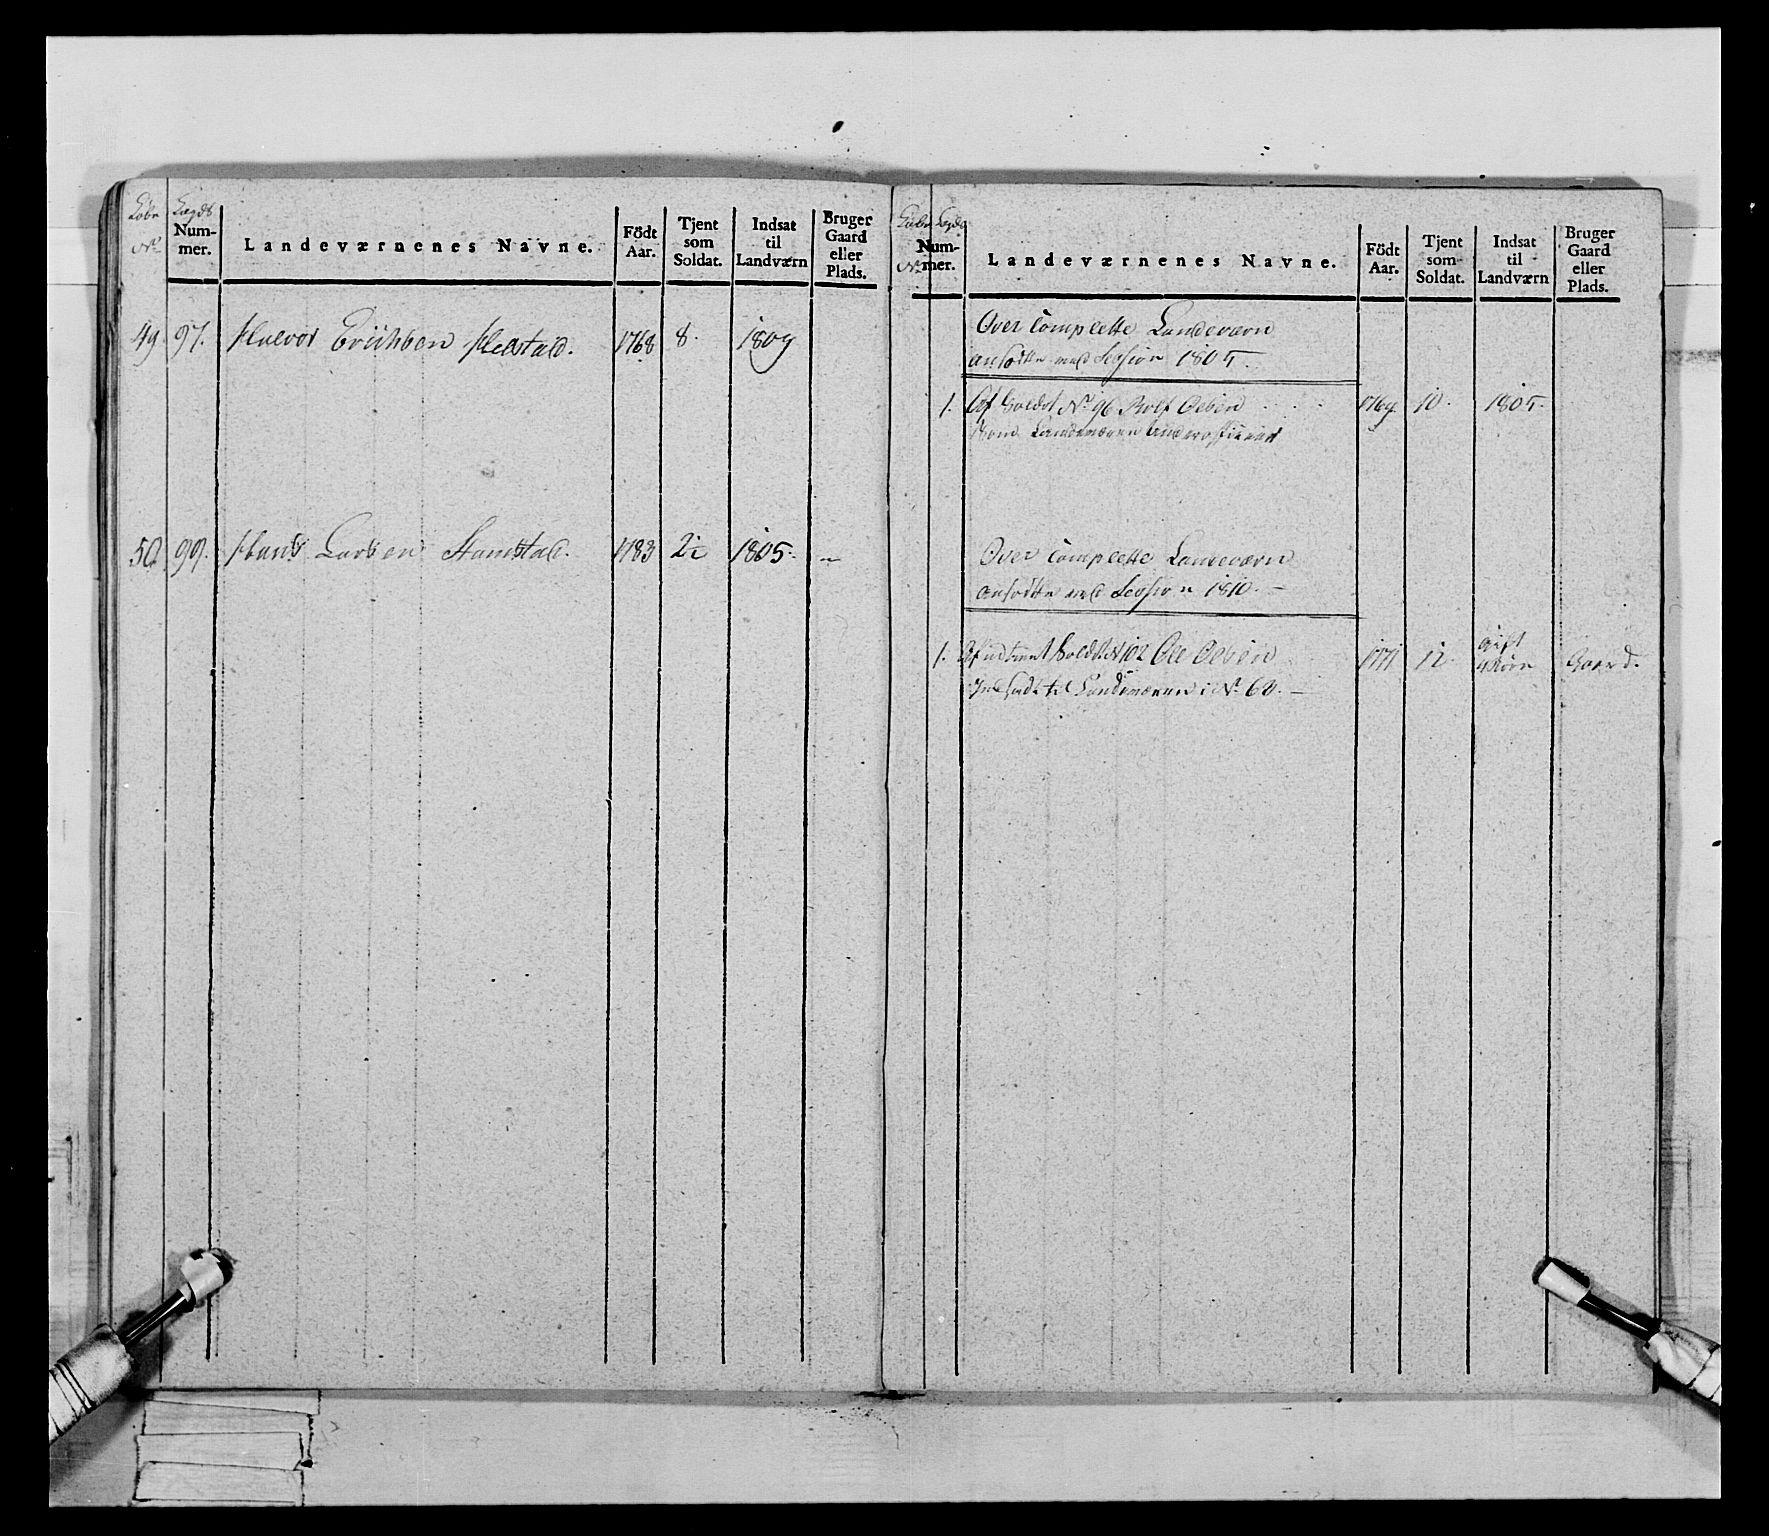 RA, Generalitets- og kommissariatskollegiet, Det kongelige norske kommissariatskollegium, E/Eh/L0069: Opplandske gevorbne infanteriregiment, 1810-1818, s. 651